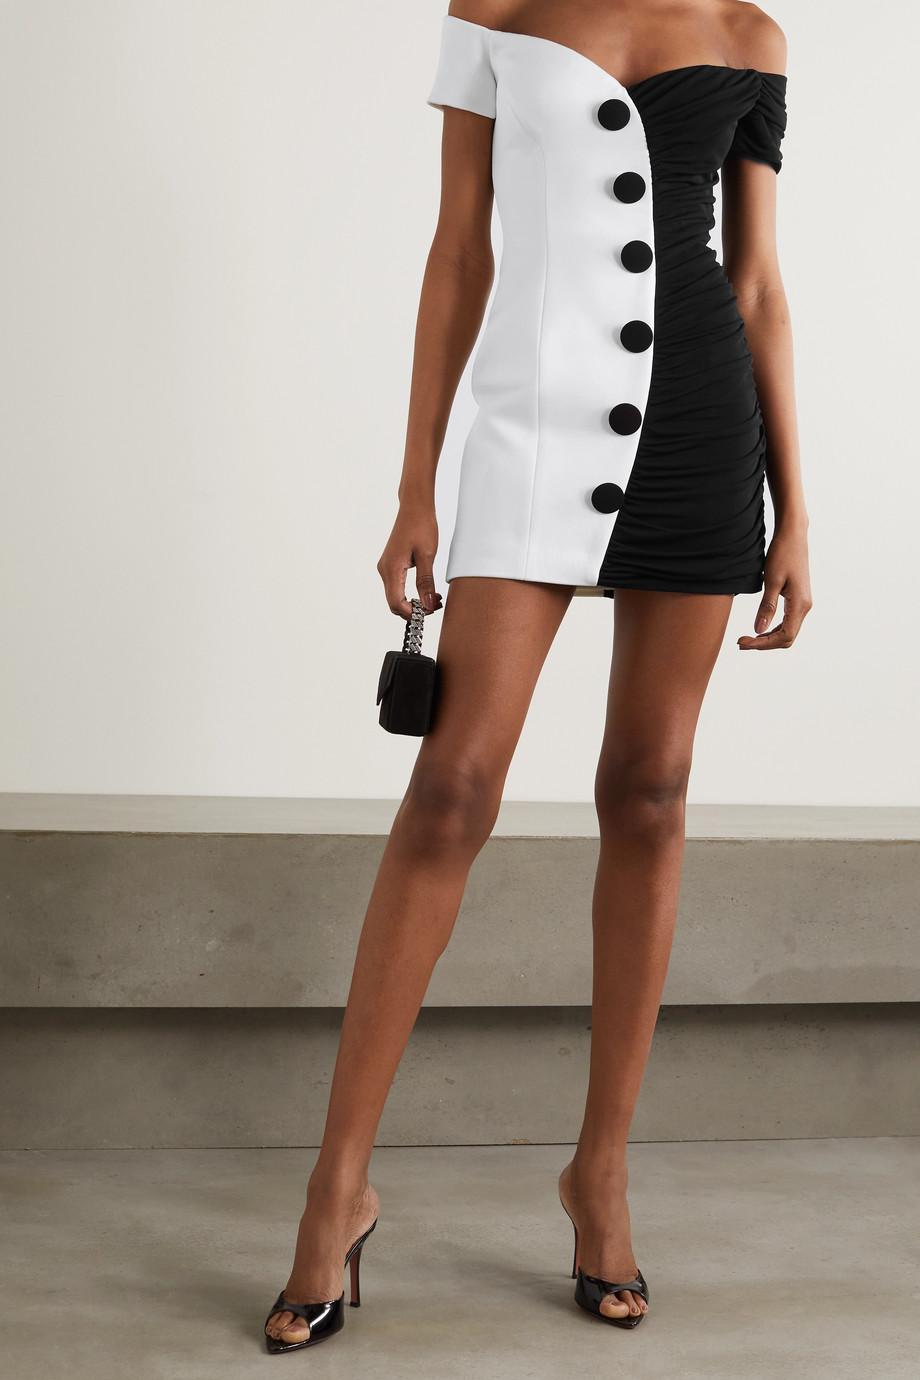 Balmain Schulterfreies, zweifarbiges Minikleid aus Crêpe